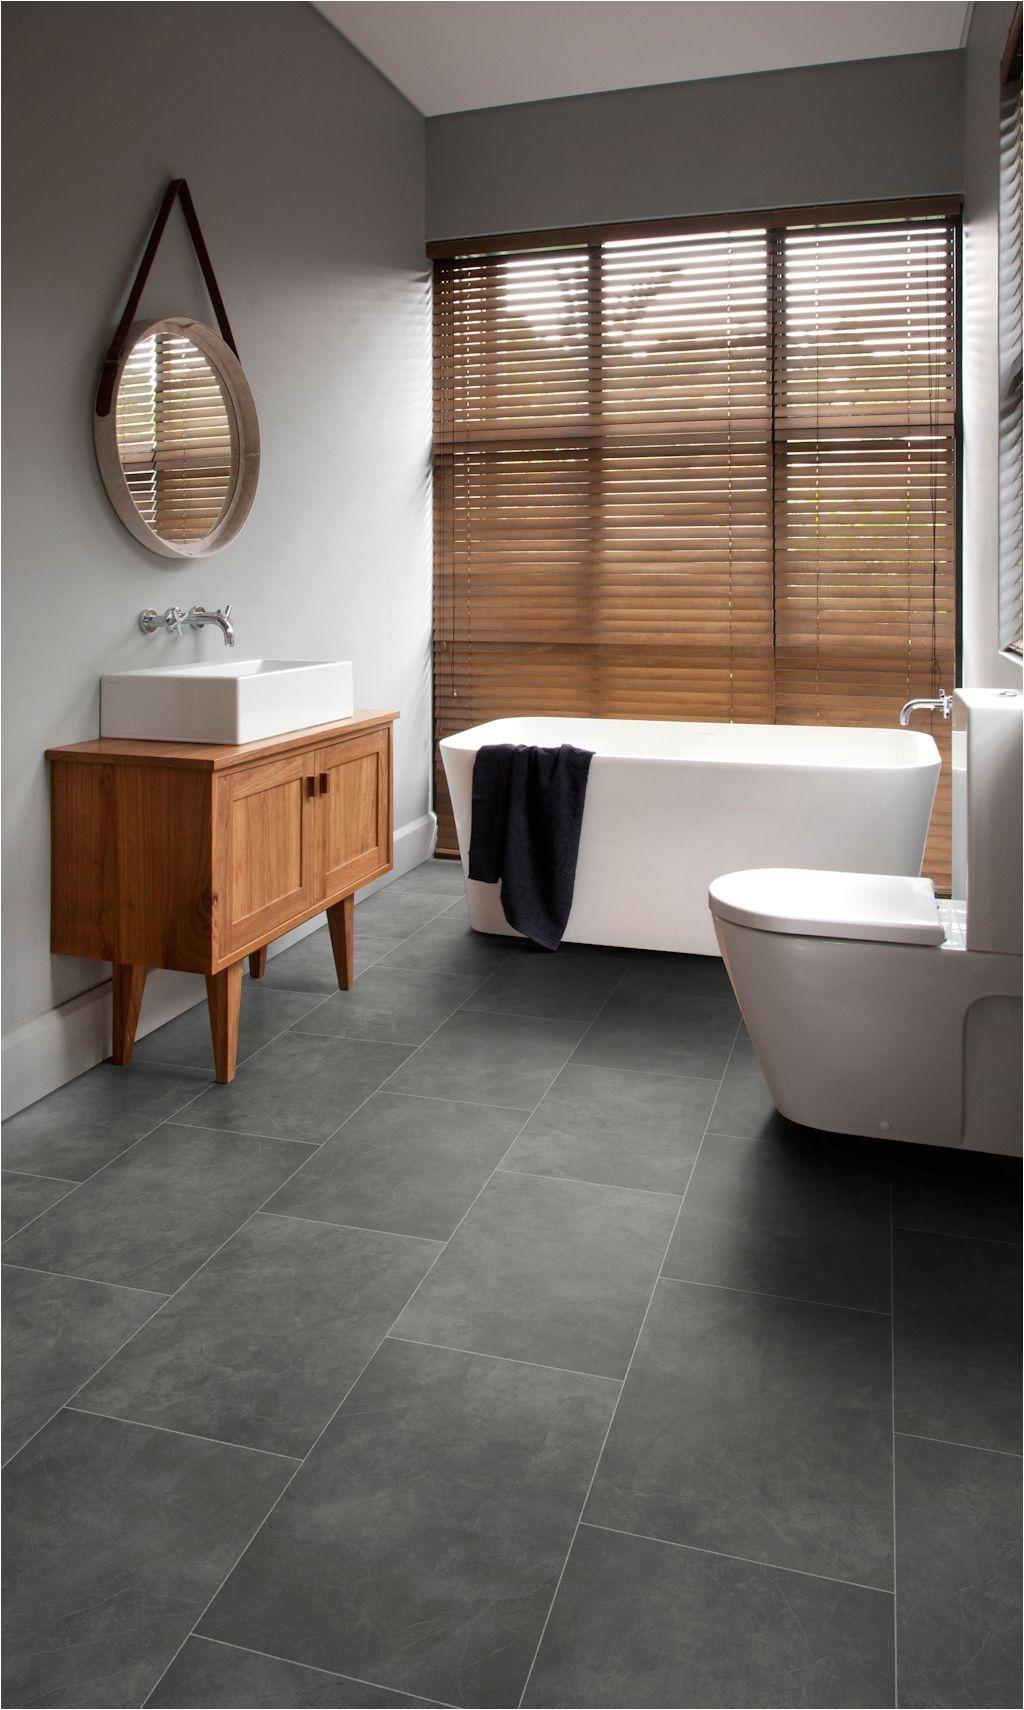 Commercial Rubber Flooring Bathroom Featuring Secura Pur Luxury